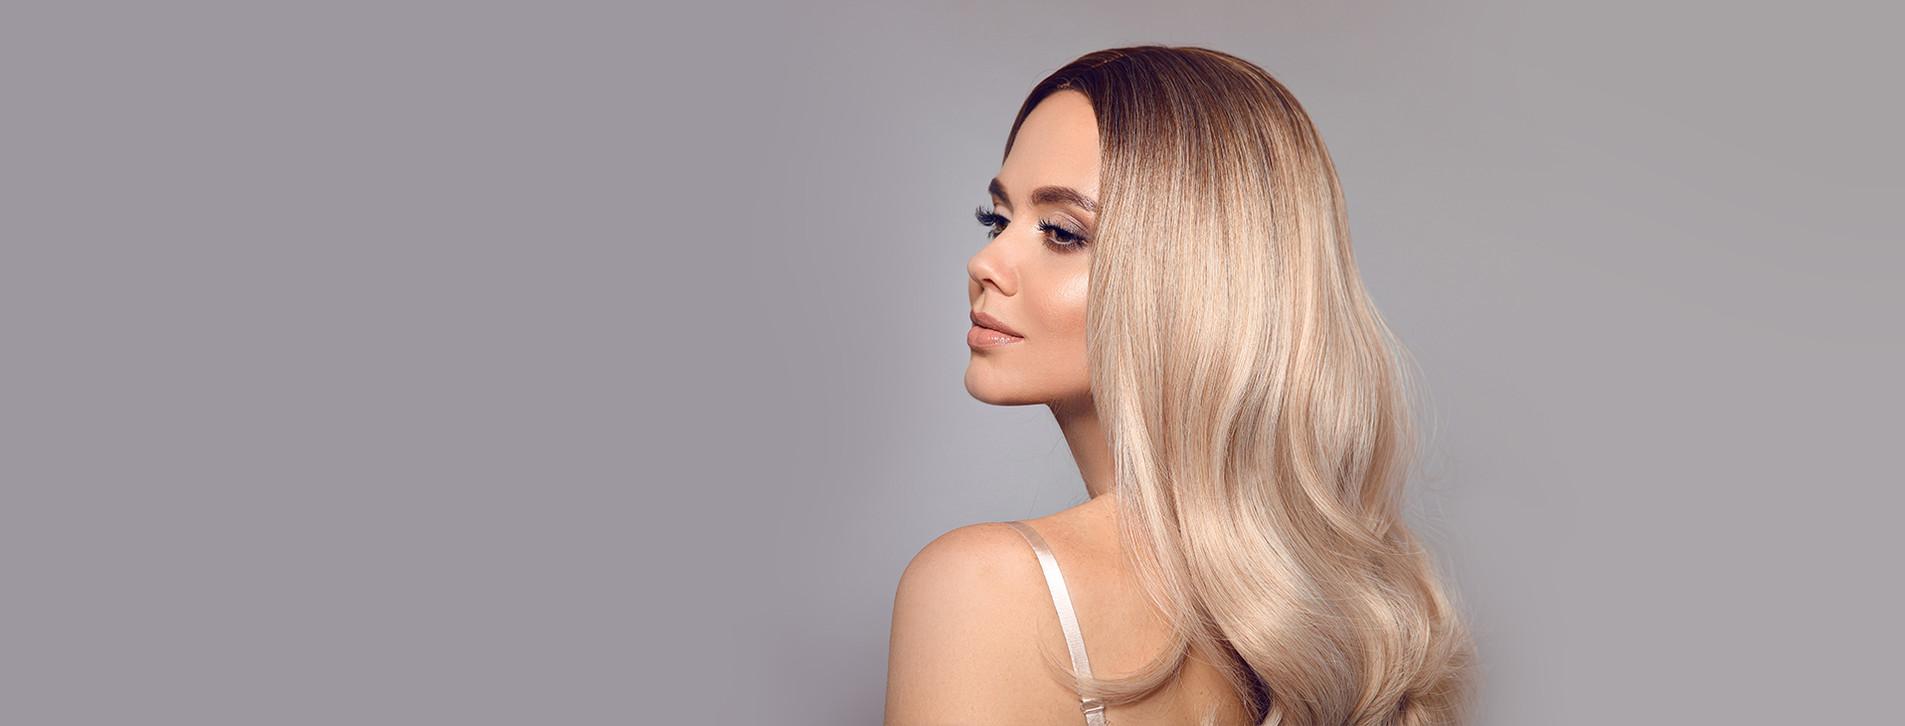 Фото 1 - Стильная покраска волос